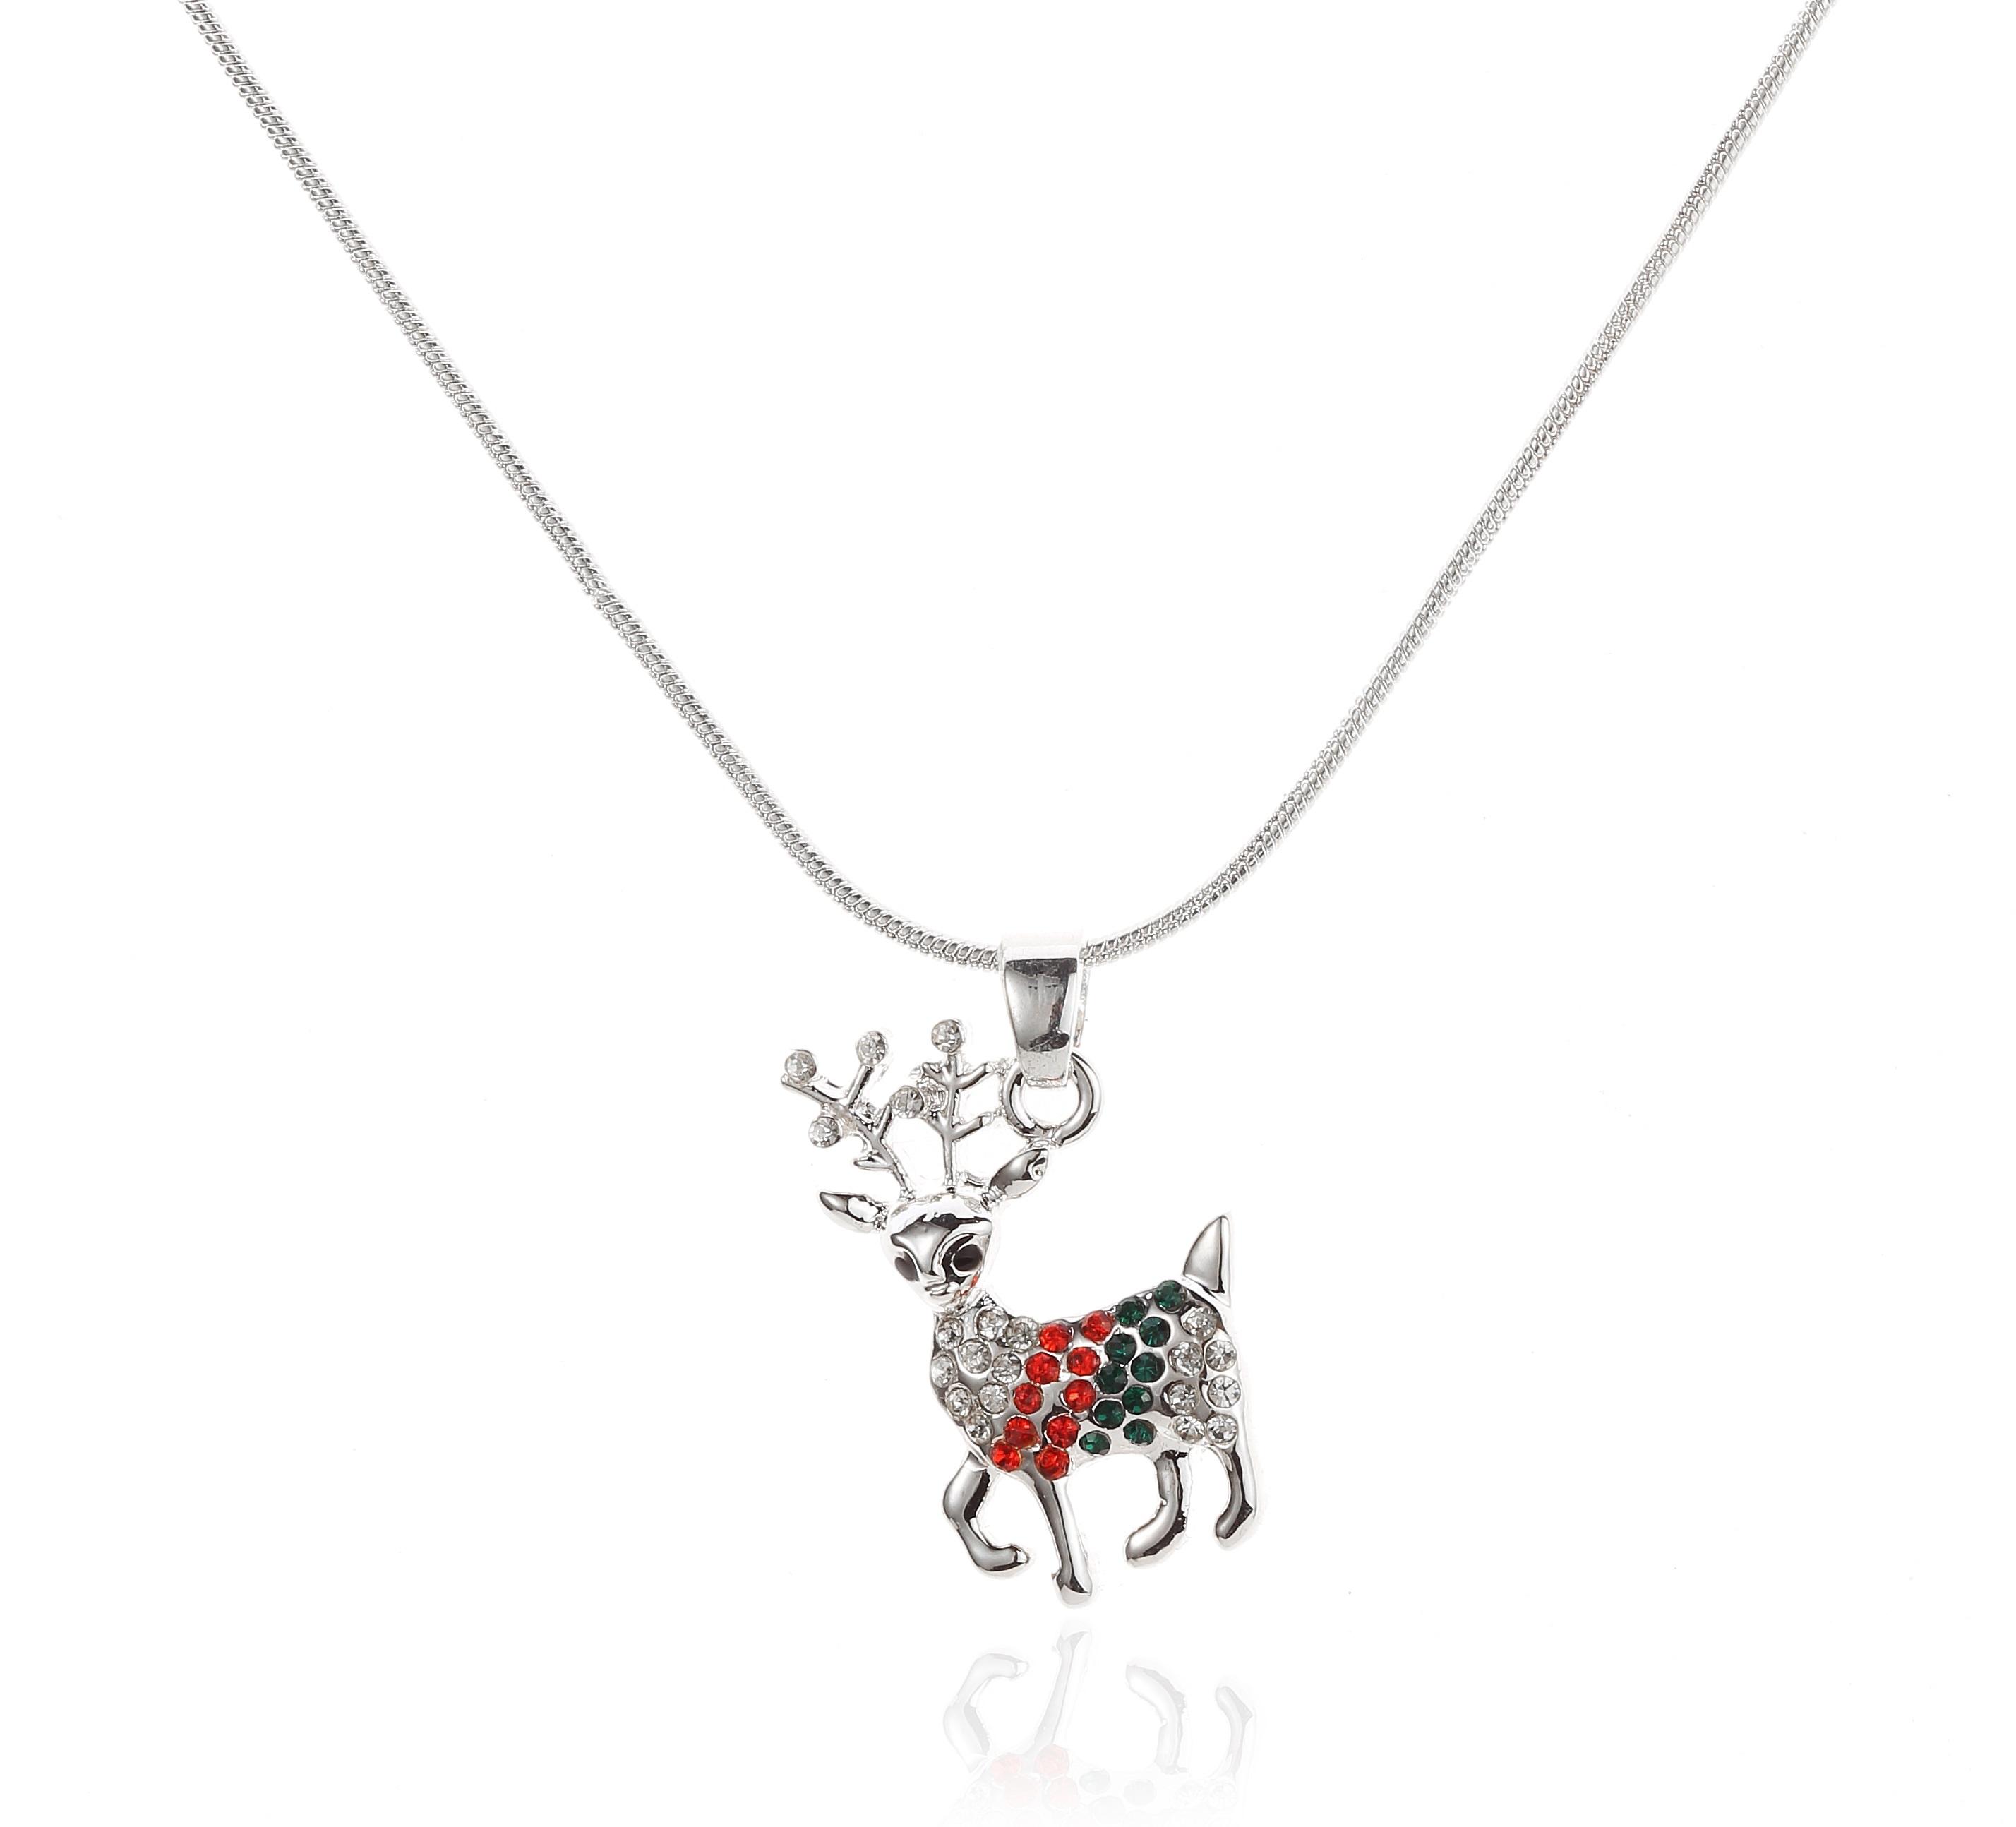 Swarovski Elements Reindeer Pendant Necklace